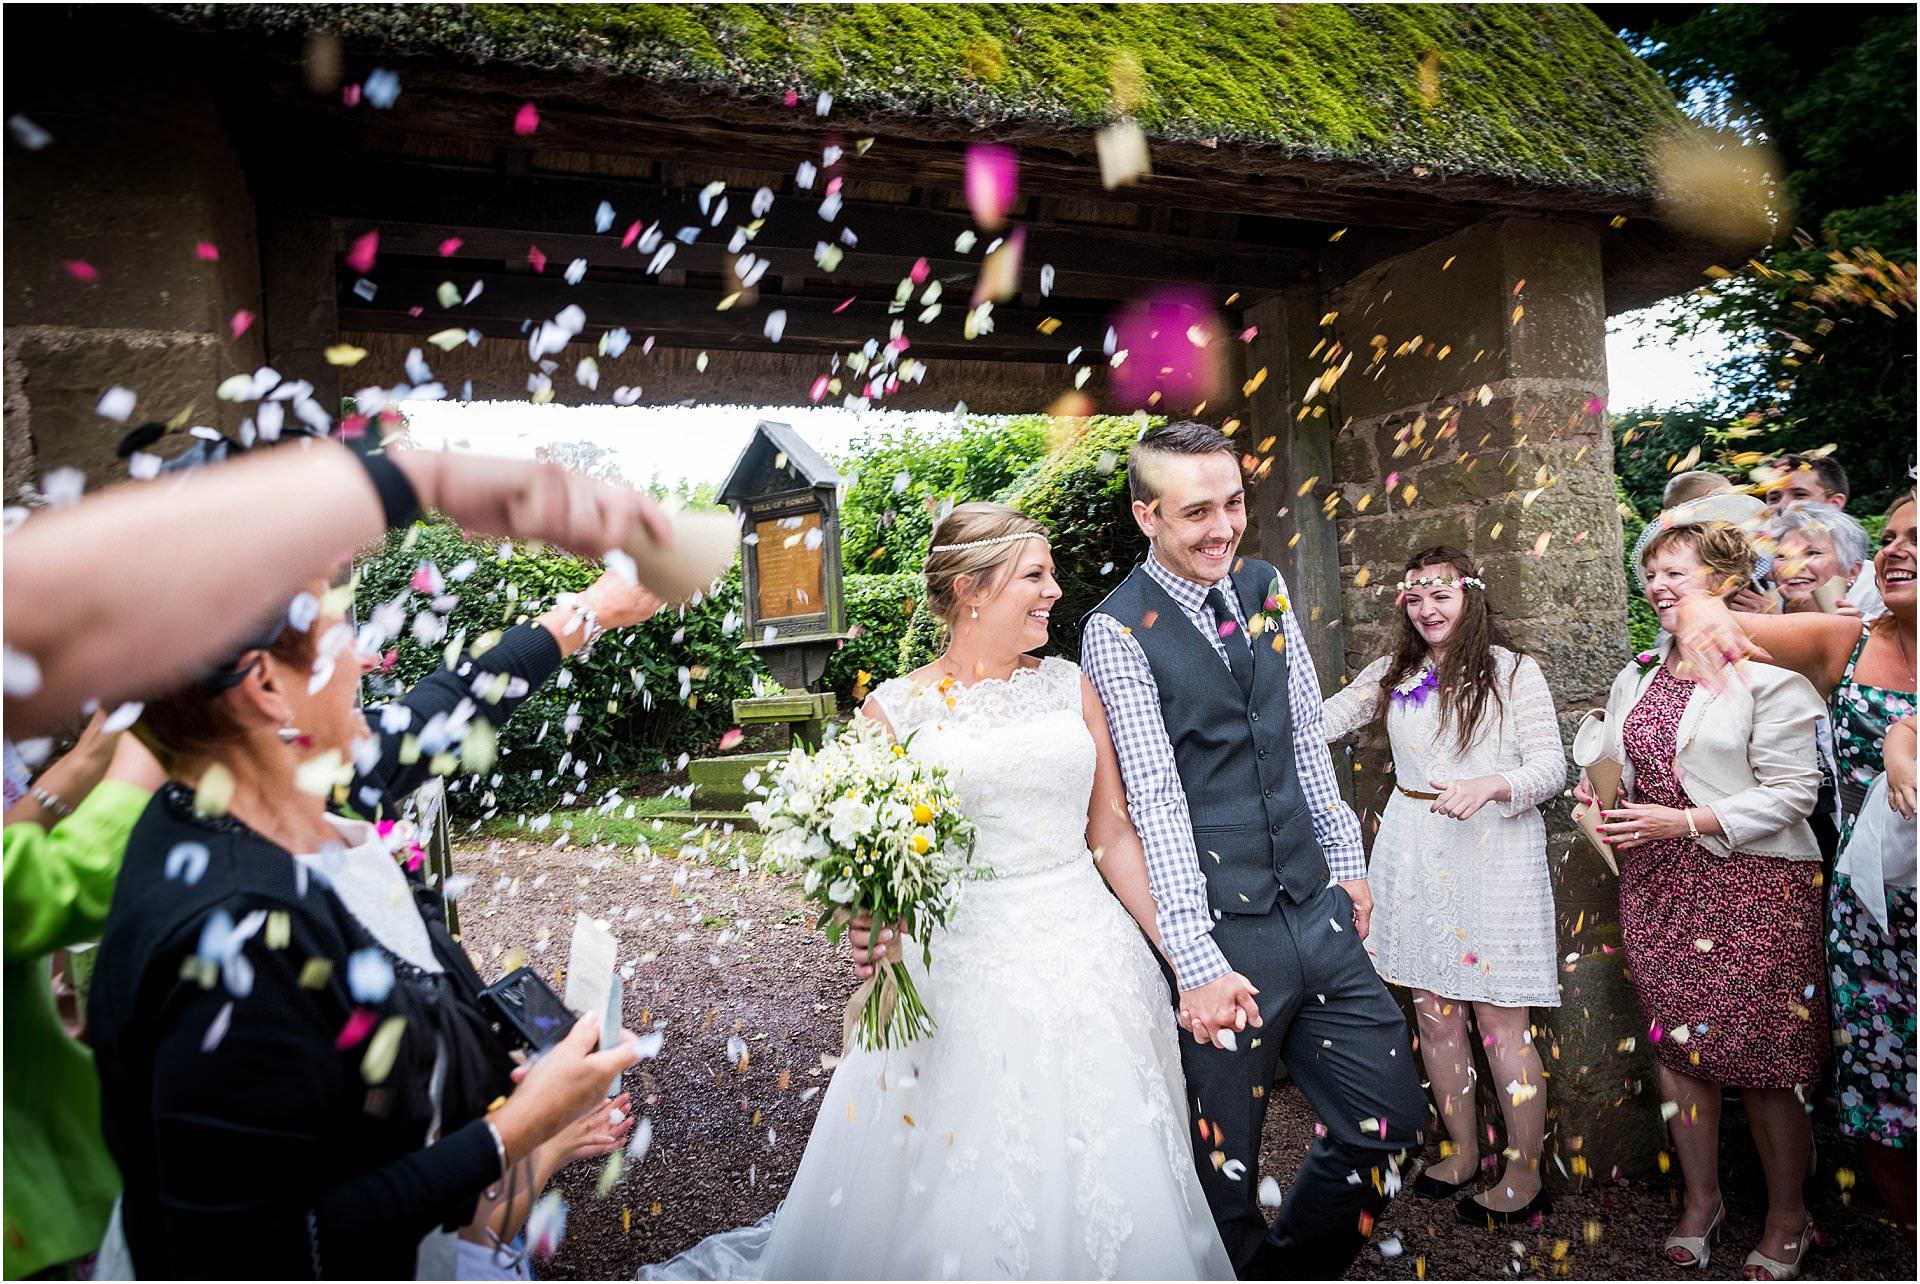 Flanesford Priory Wedding Venue Goodrich Herefordshire